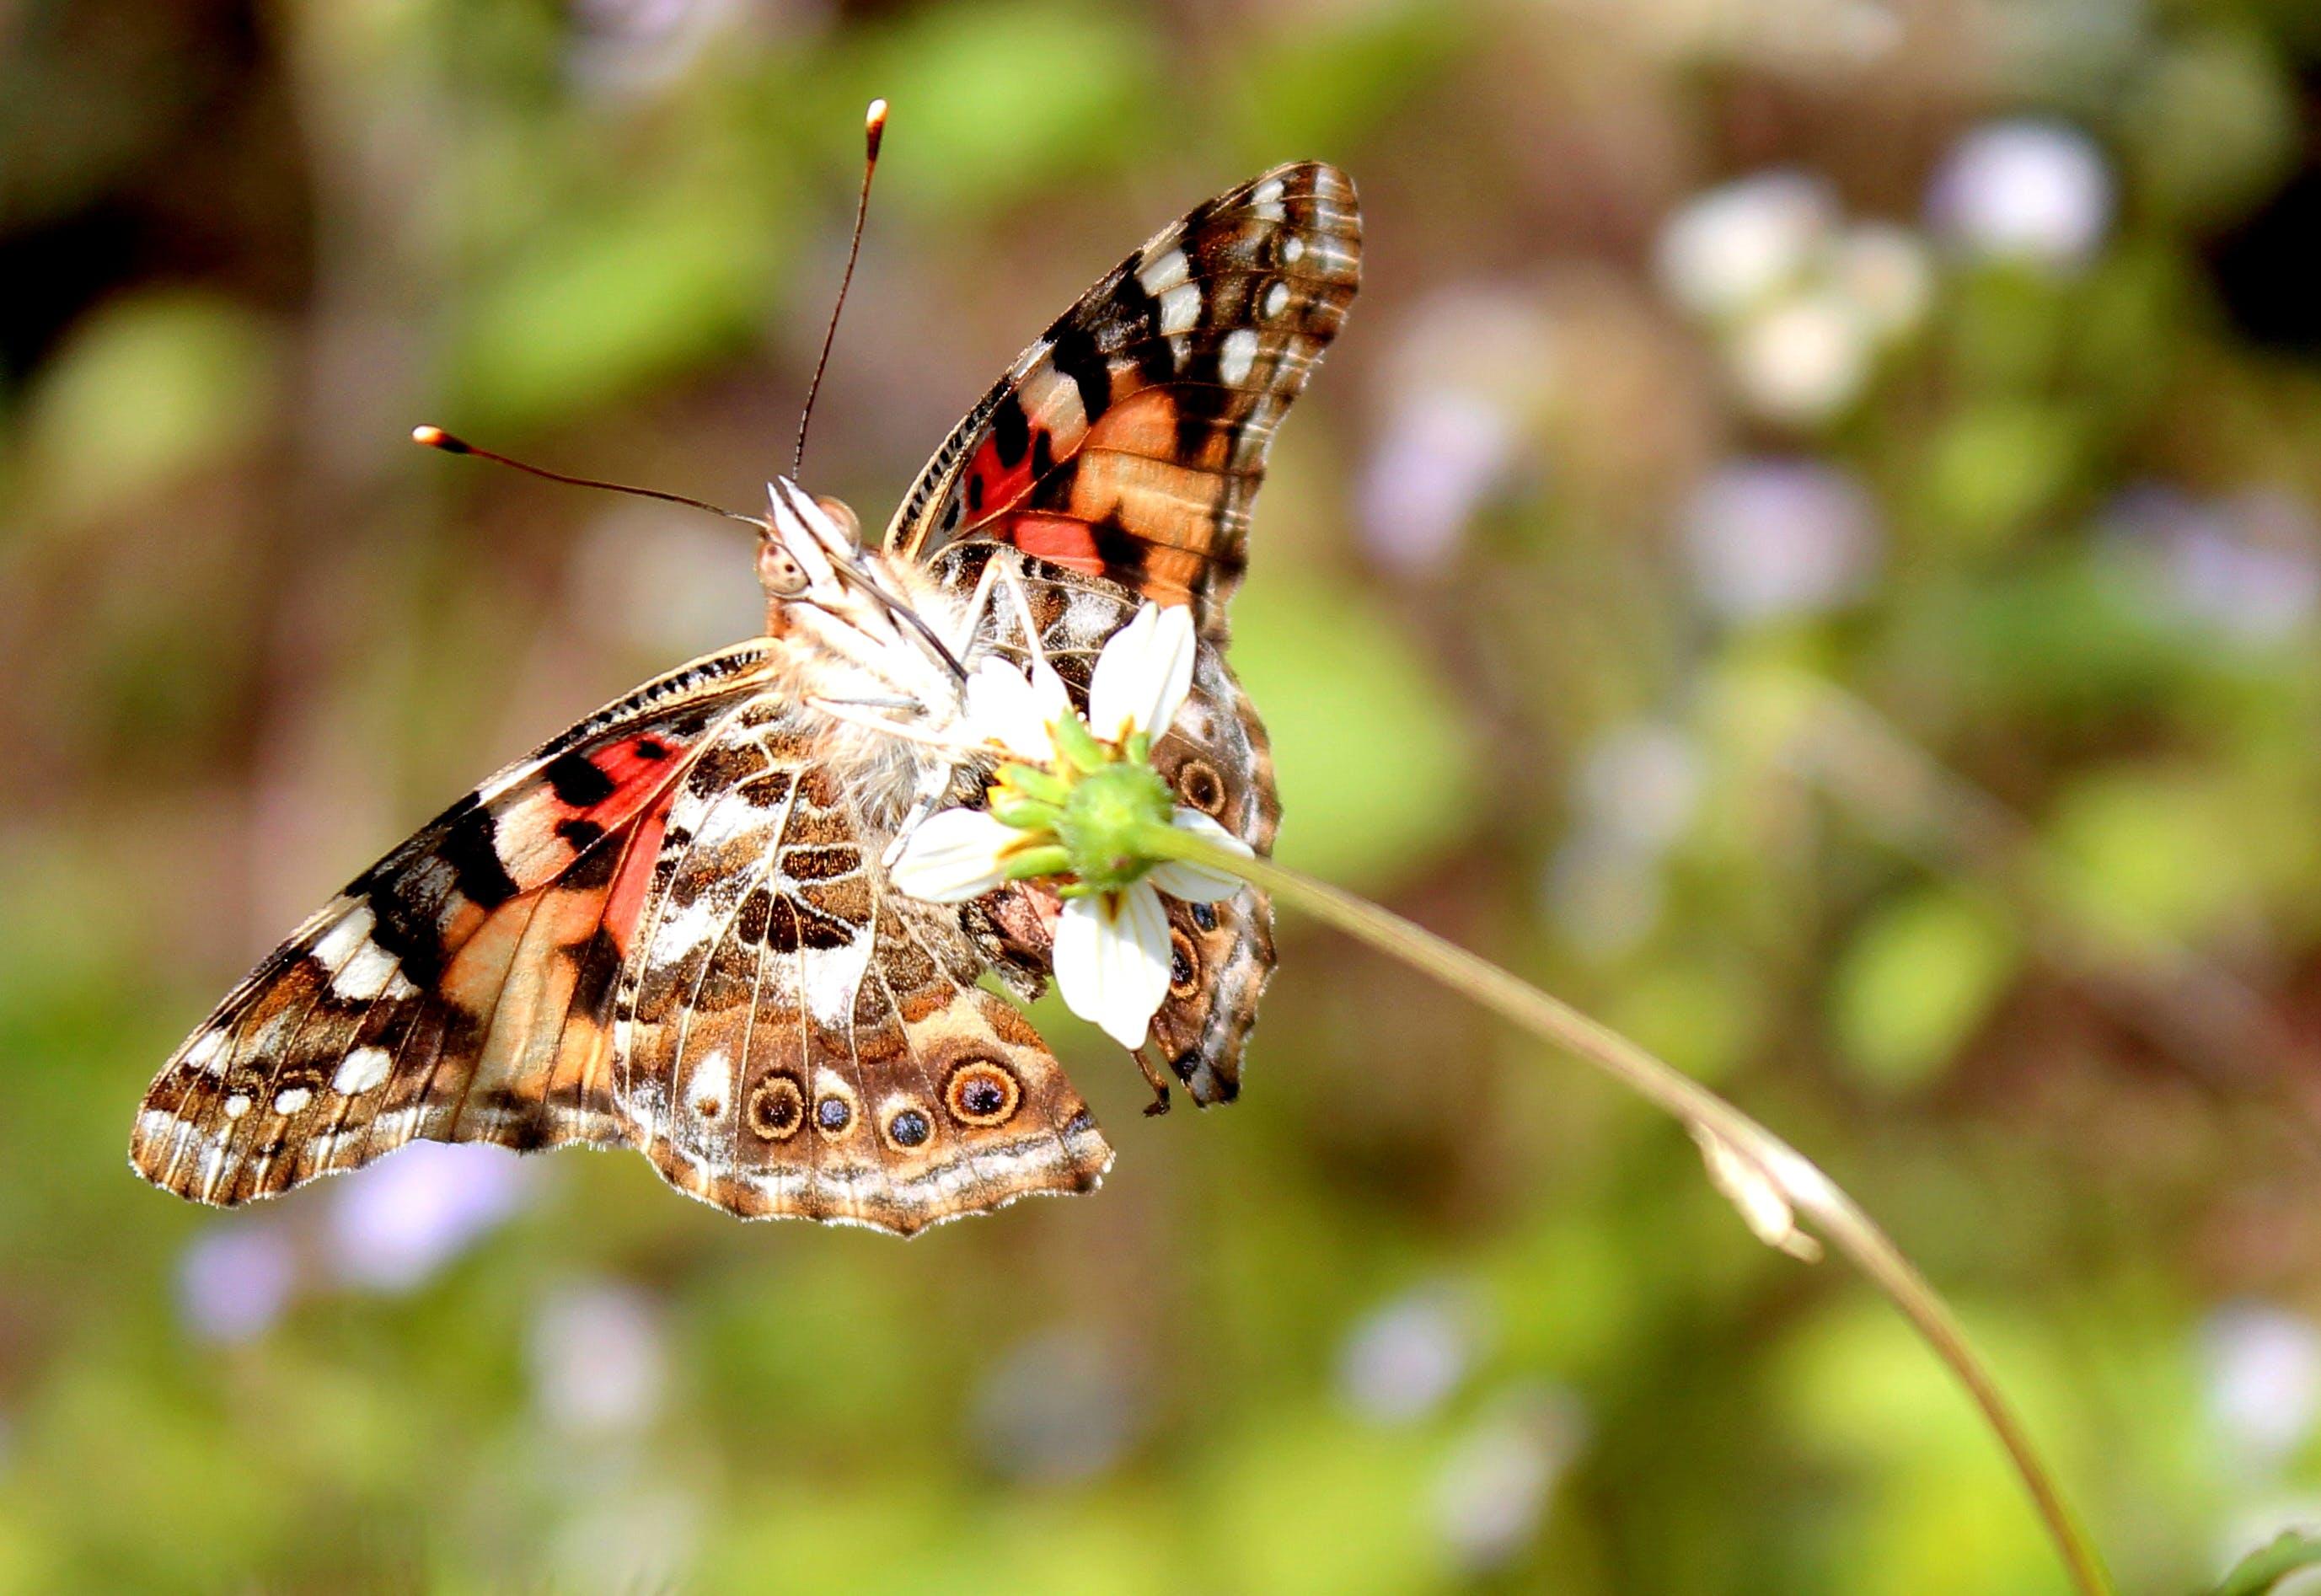 Free stock photo of #adventure, #bug, #butterfly, #Macro